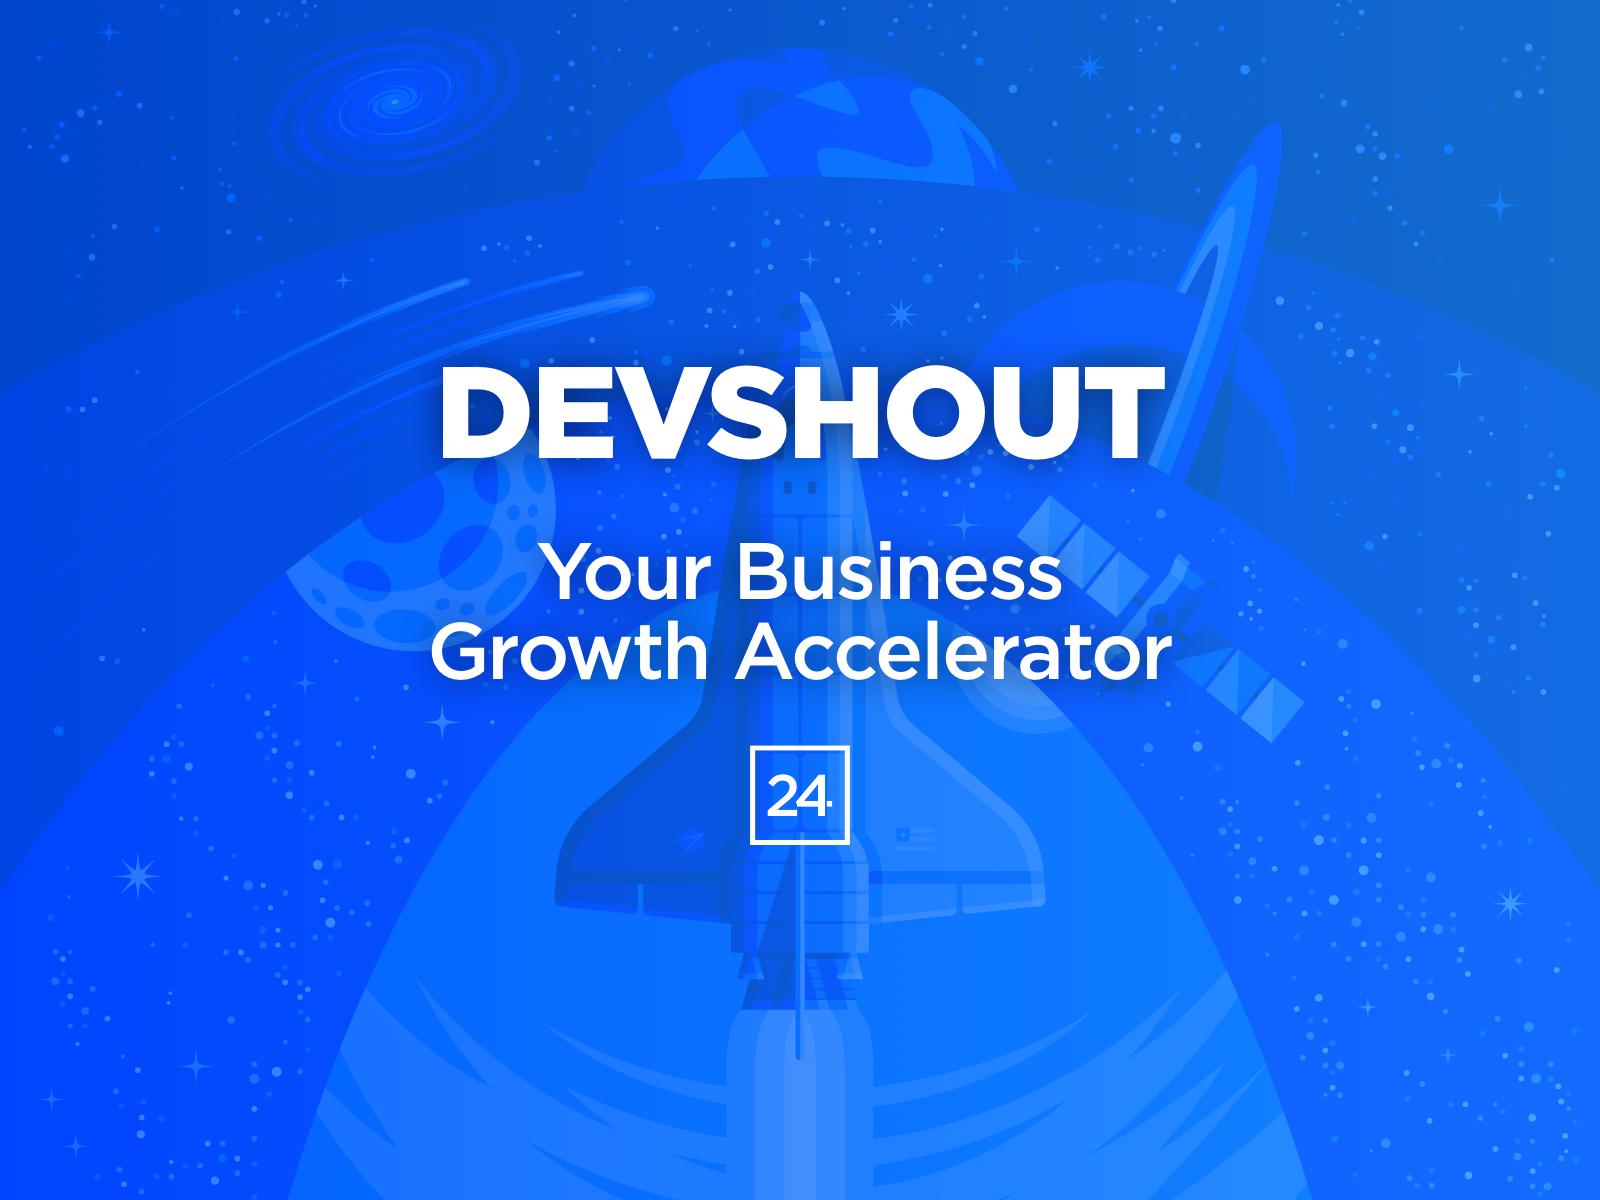 devshout_accelerator_image.png